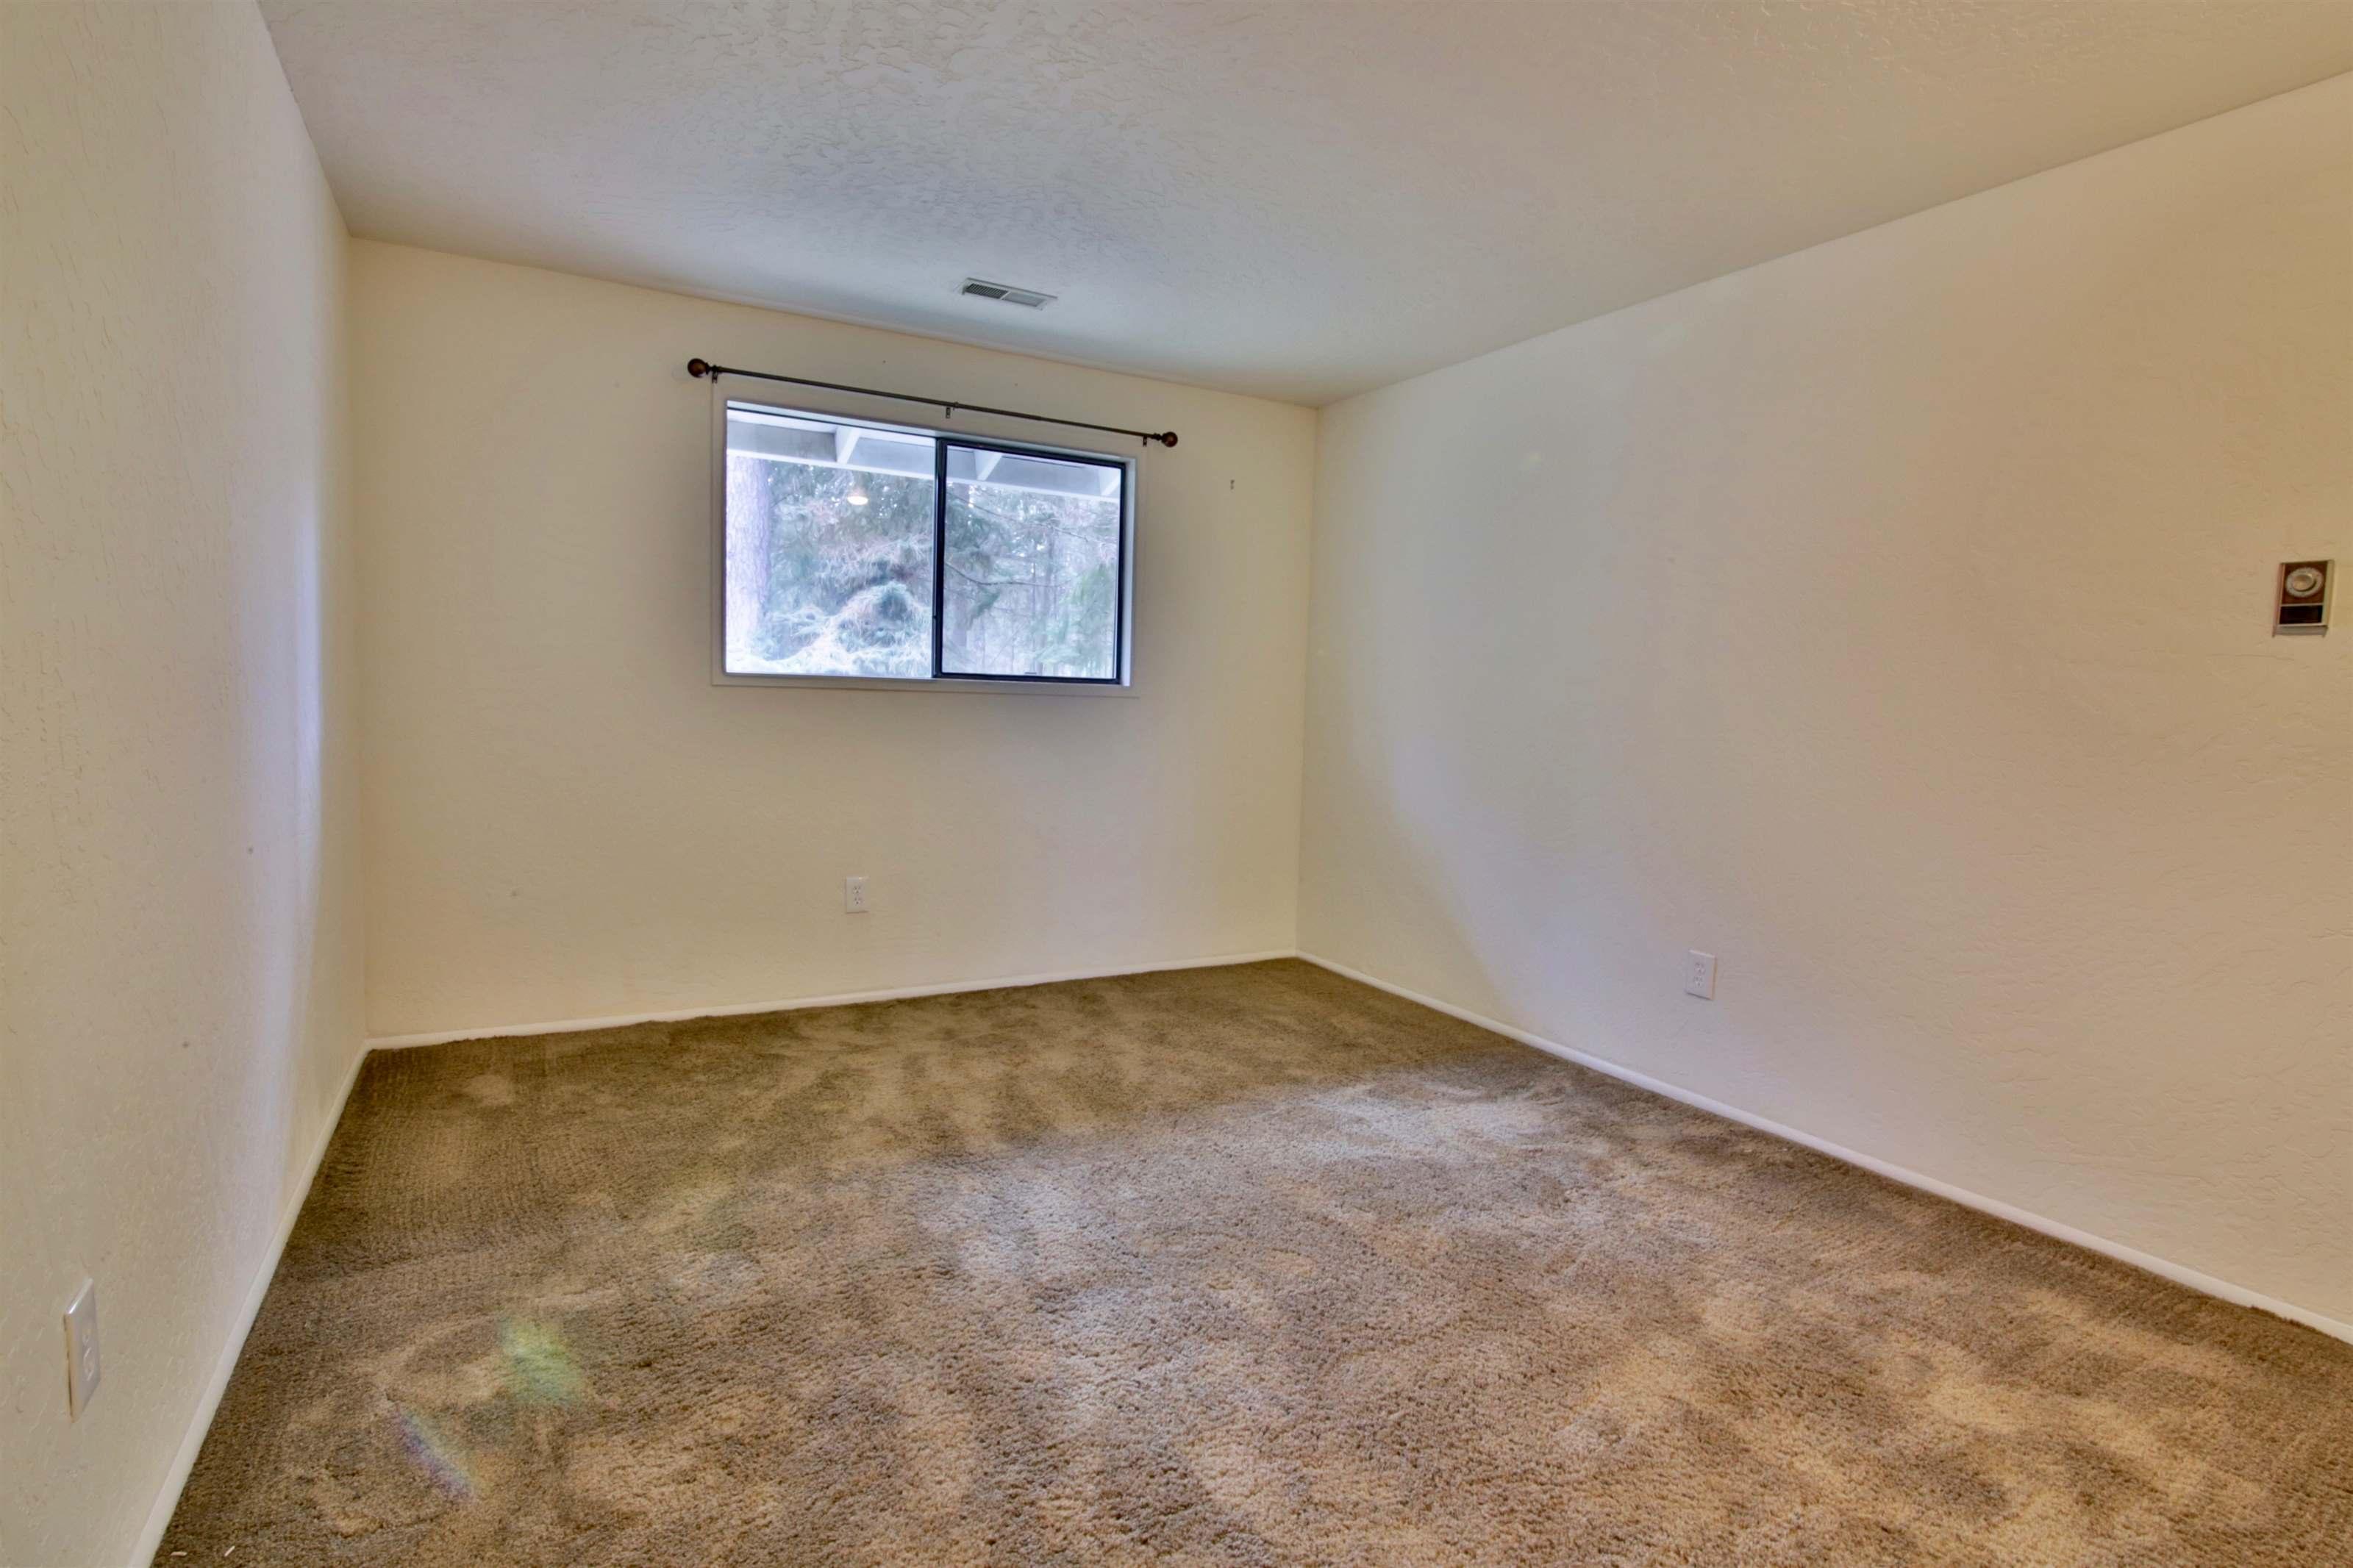 4104 W Arrowhead Rd, Coeur d'Alene, ID 83815